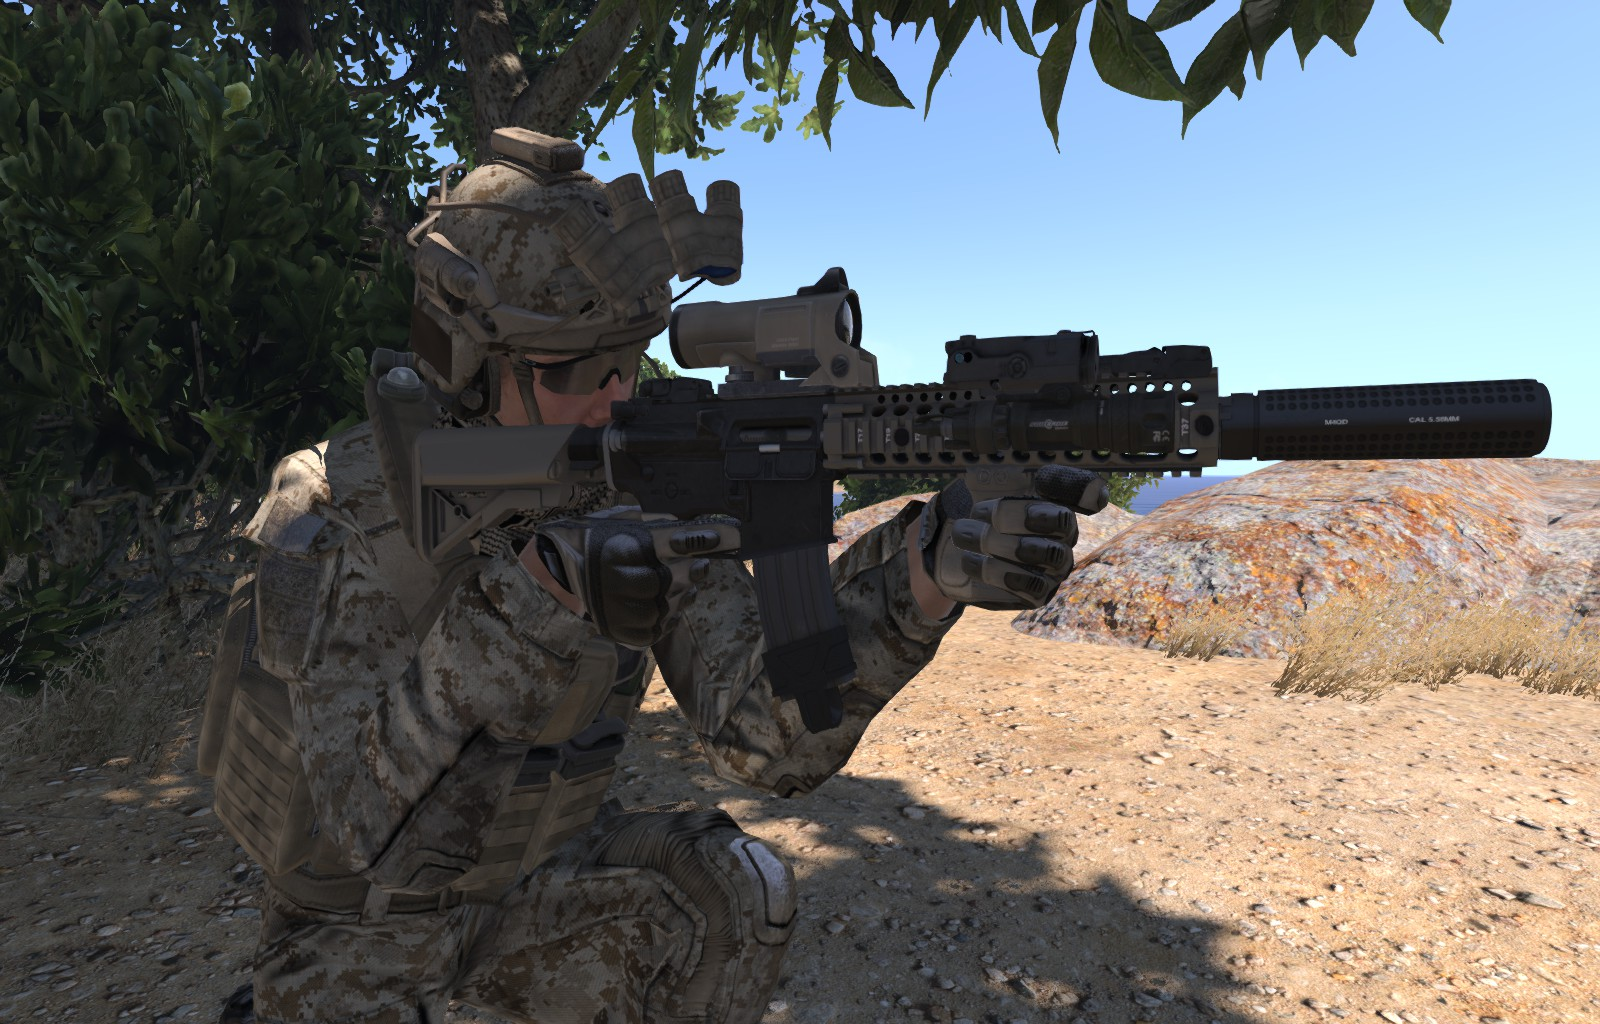 Navy Seal Cqb Tactics Manual